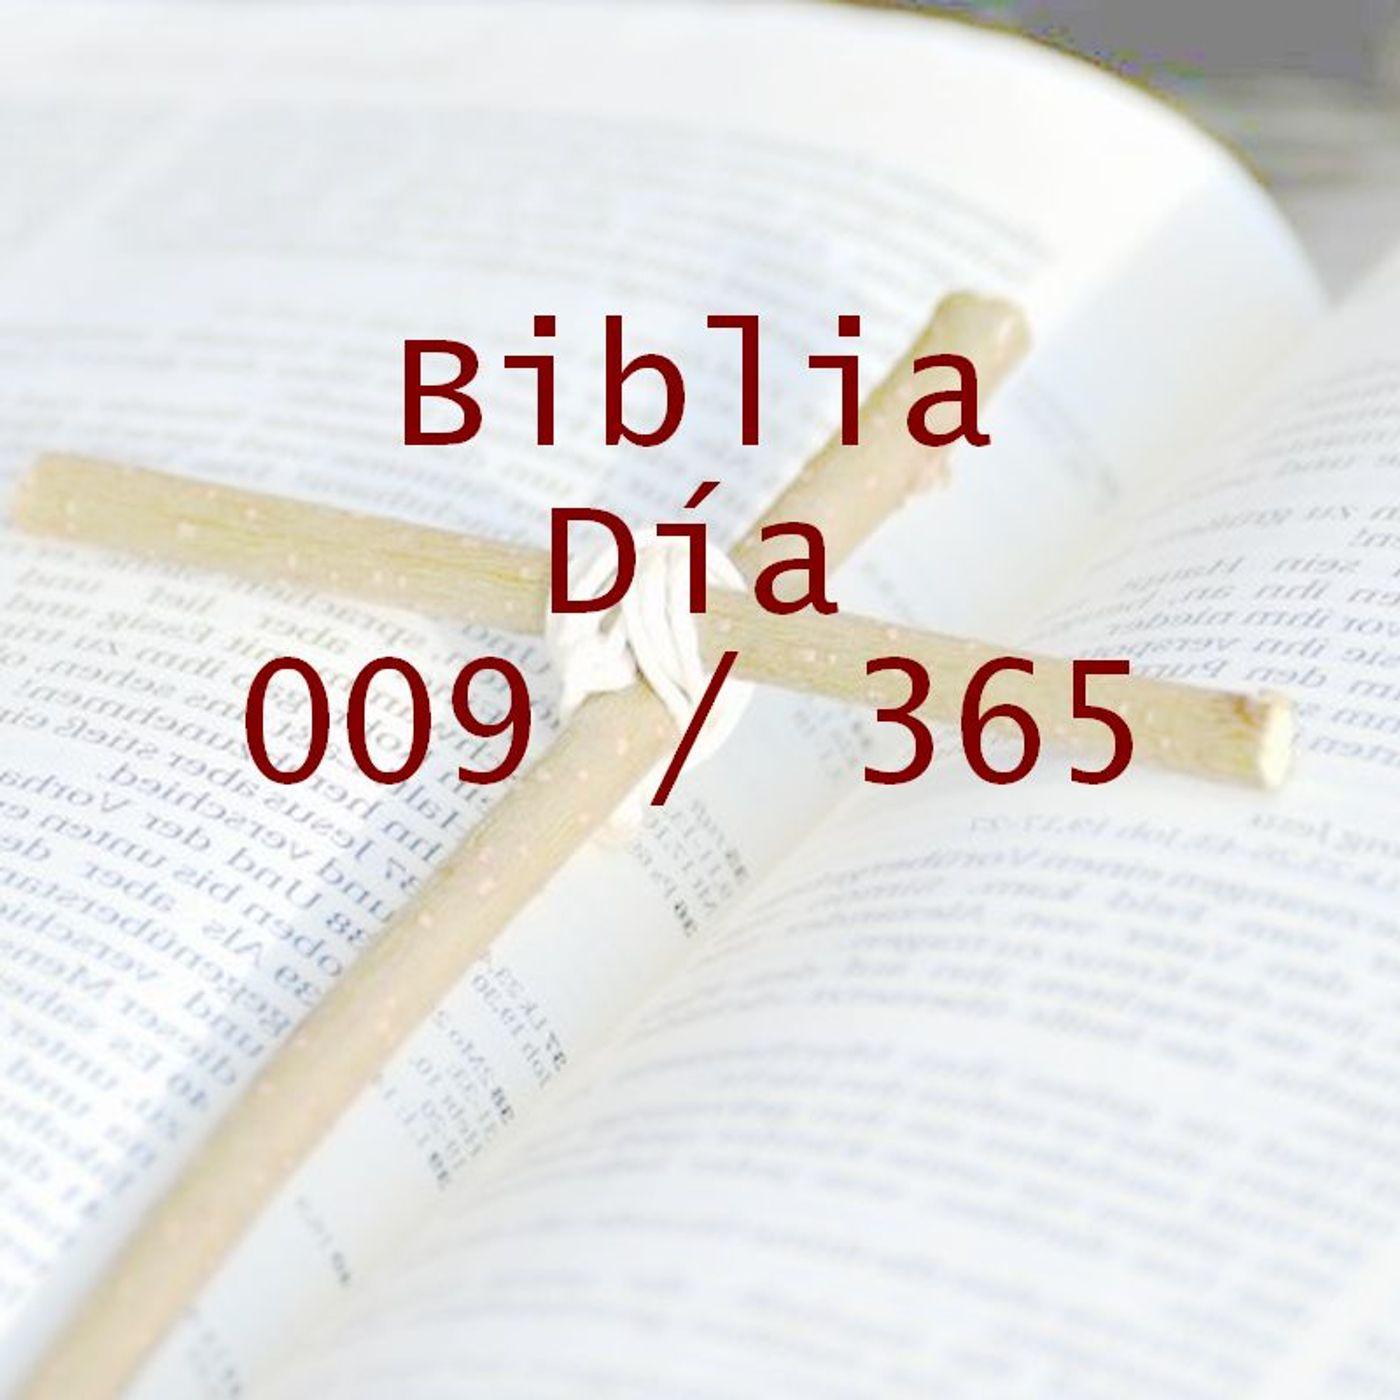 365 dias para la Biblia - Dia 009